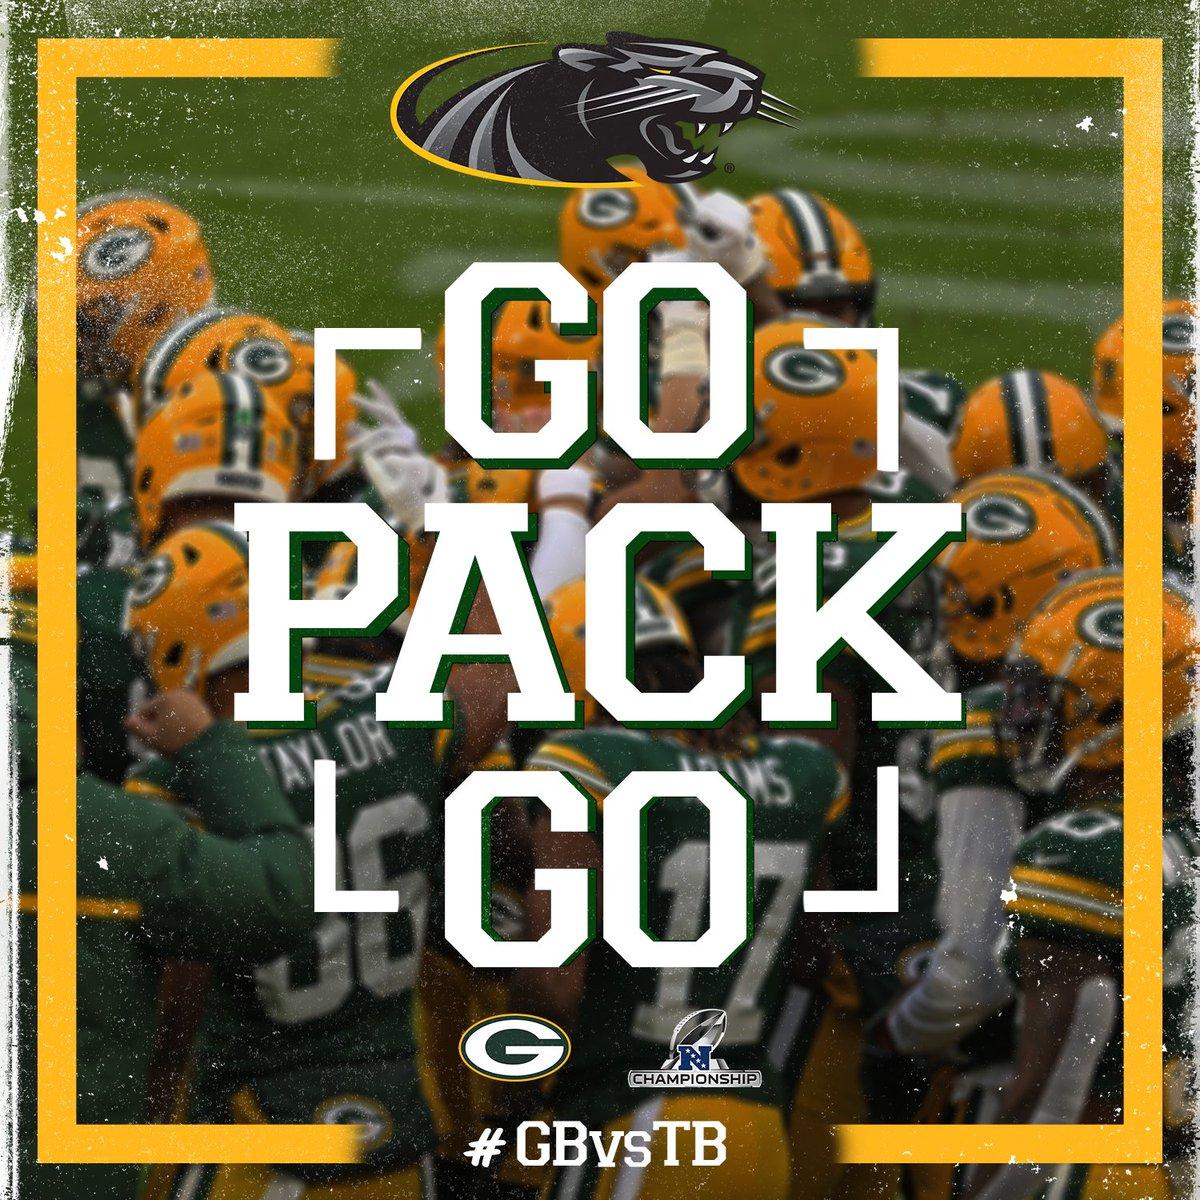 We back the Pack!  #GoPackGo | #GBvsTB